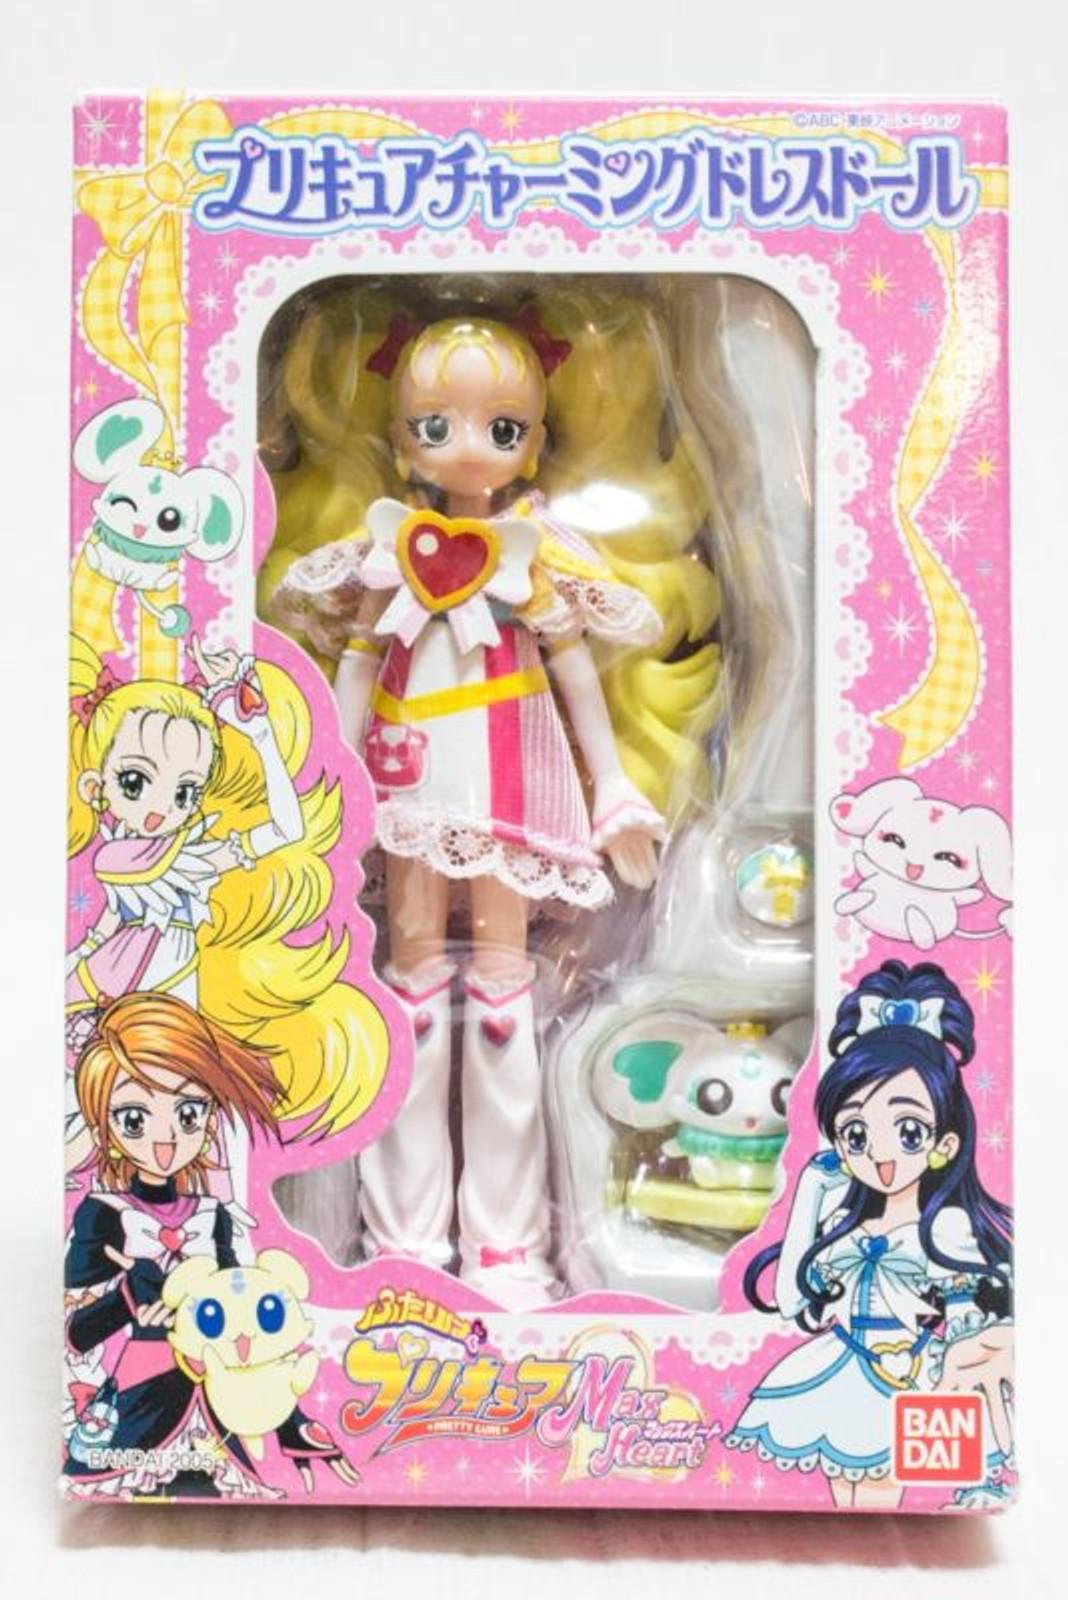 Futari wa Pretty Cure Max Heart Shinny Luminous Charming Dress Doll Figure Bandai JAPAN